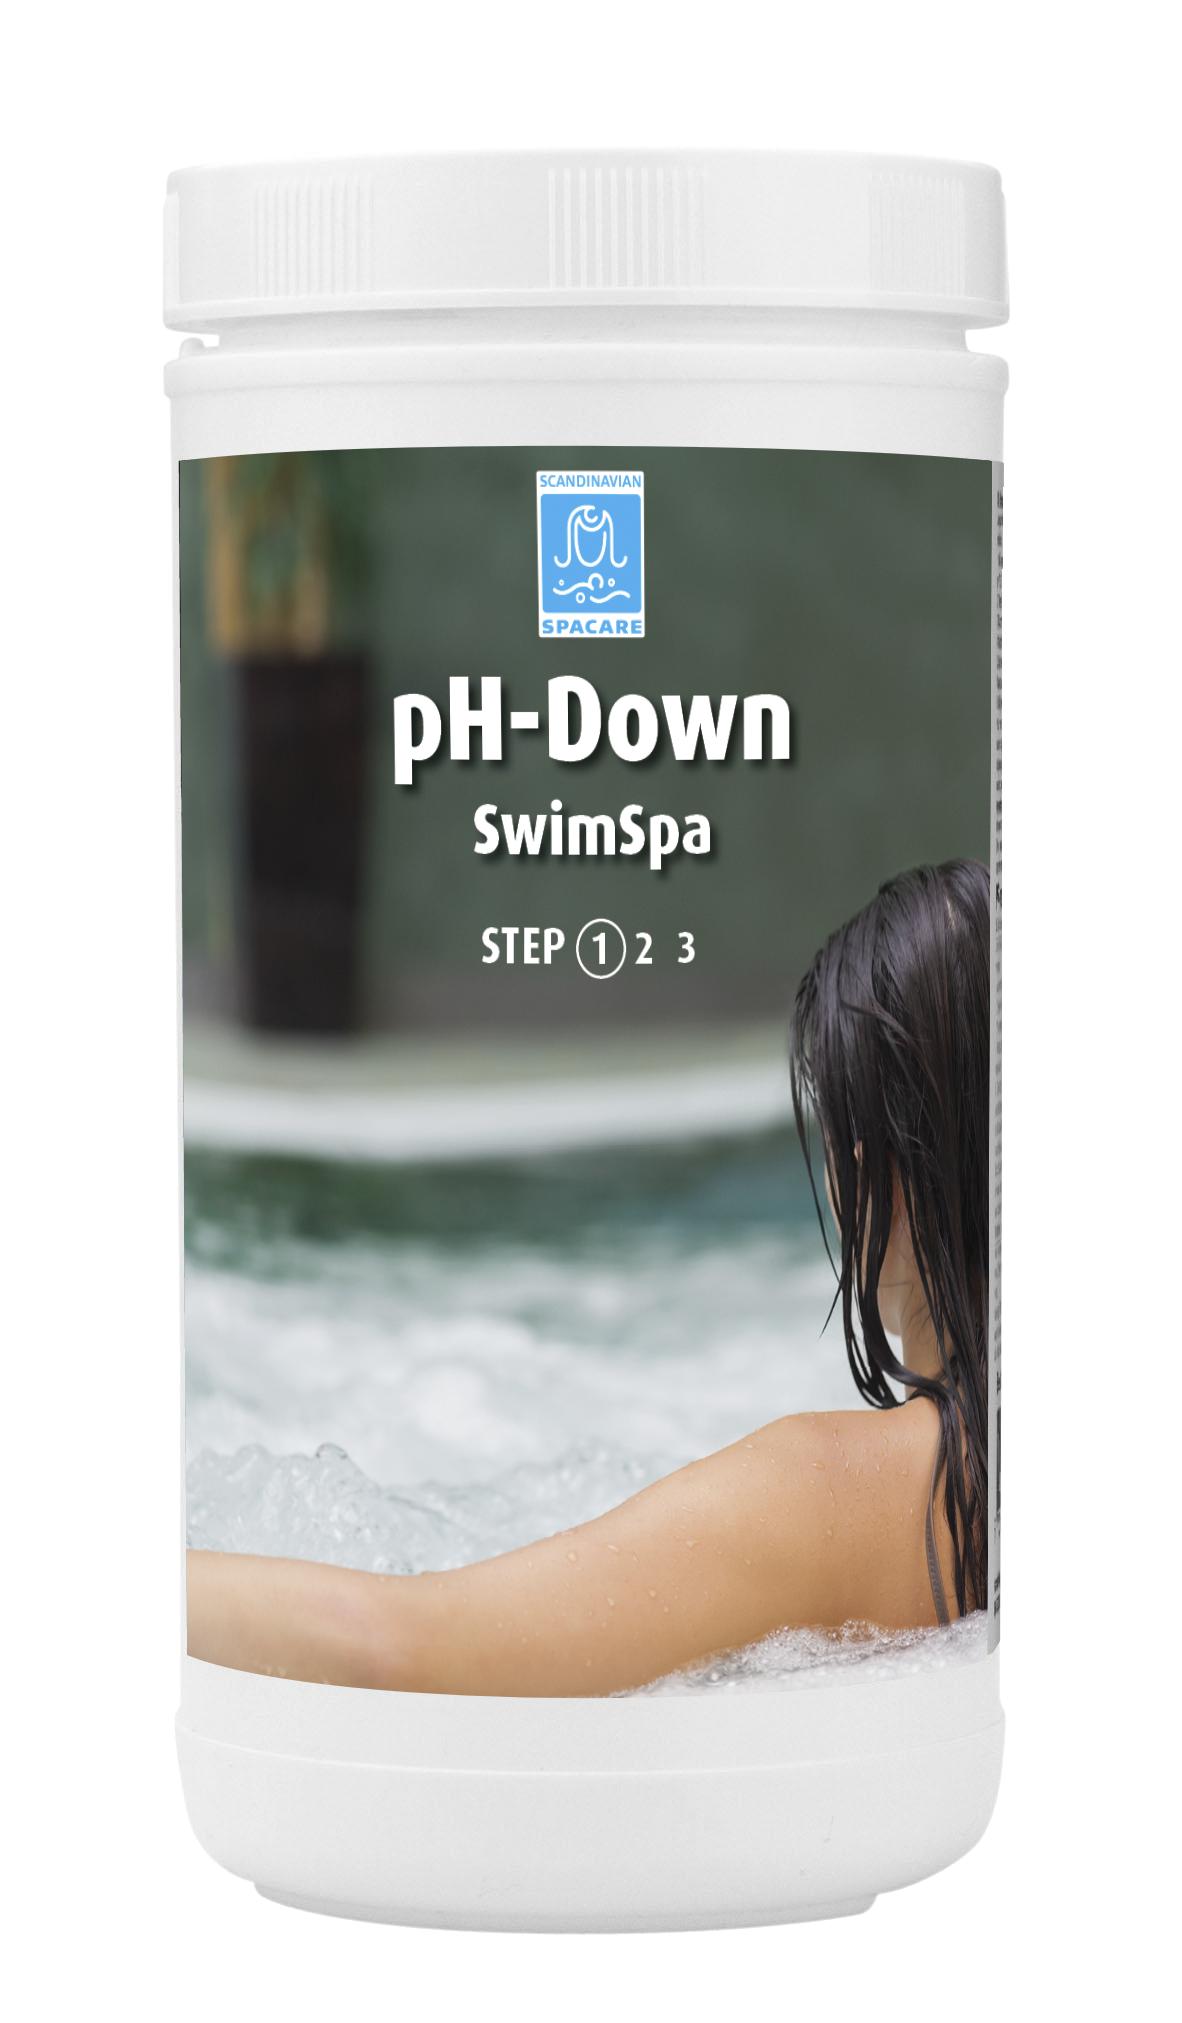 SpaCare SwimSpa pH-Down Granular